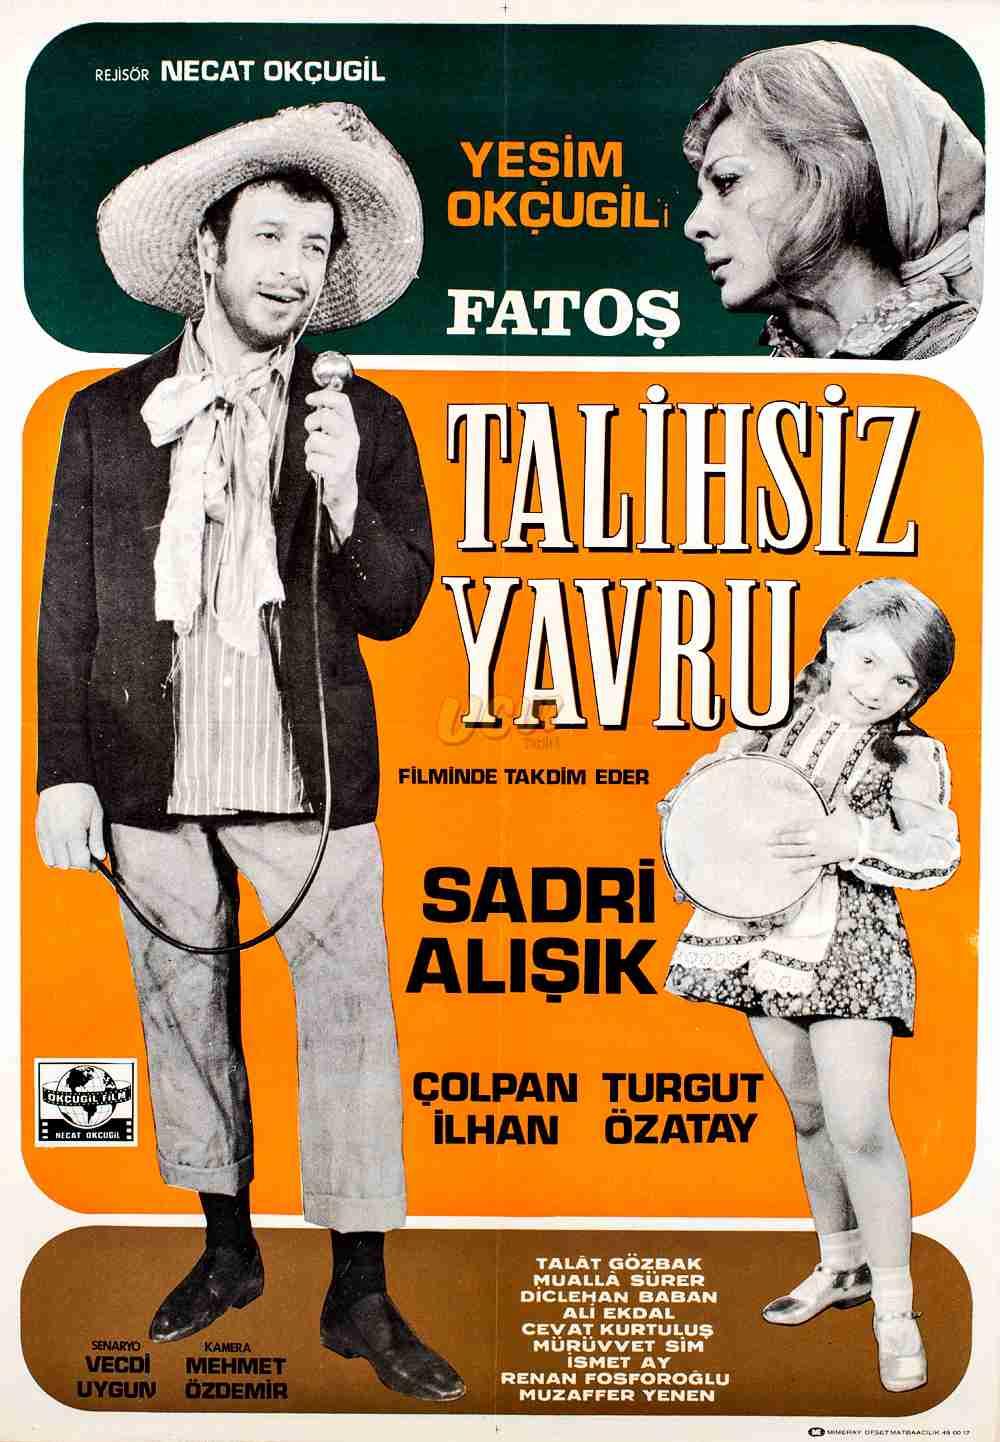 fatos_talihsiz_yavru_1970-2